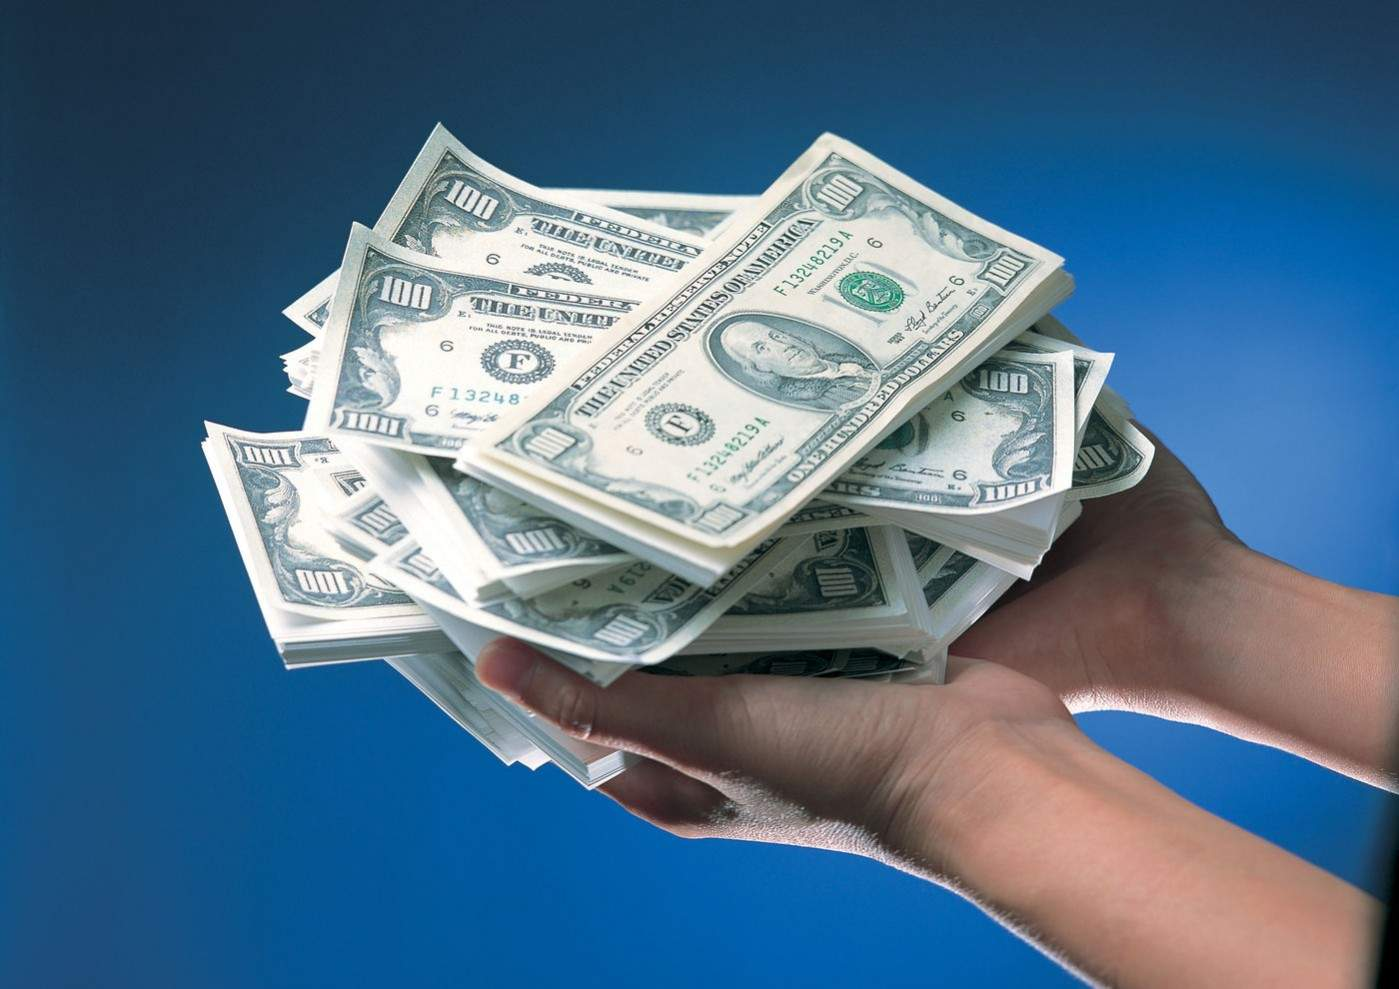 kredit tanpa agunan disetujui